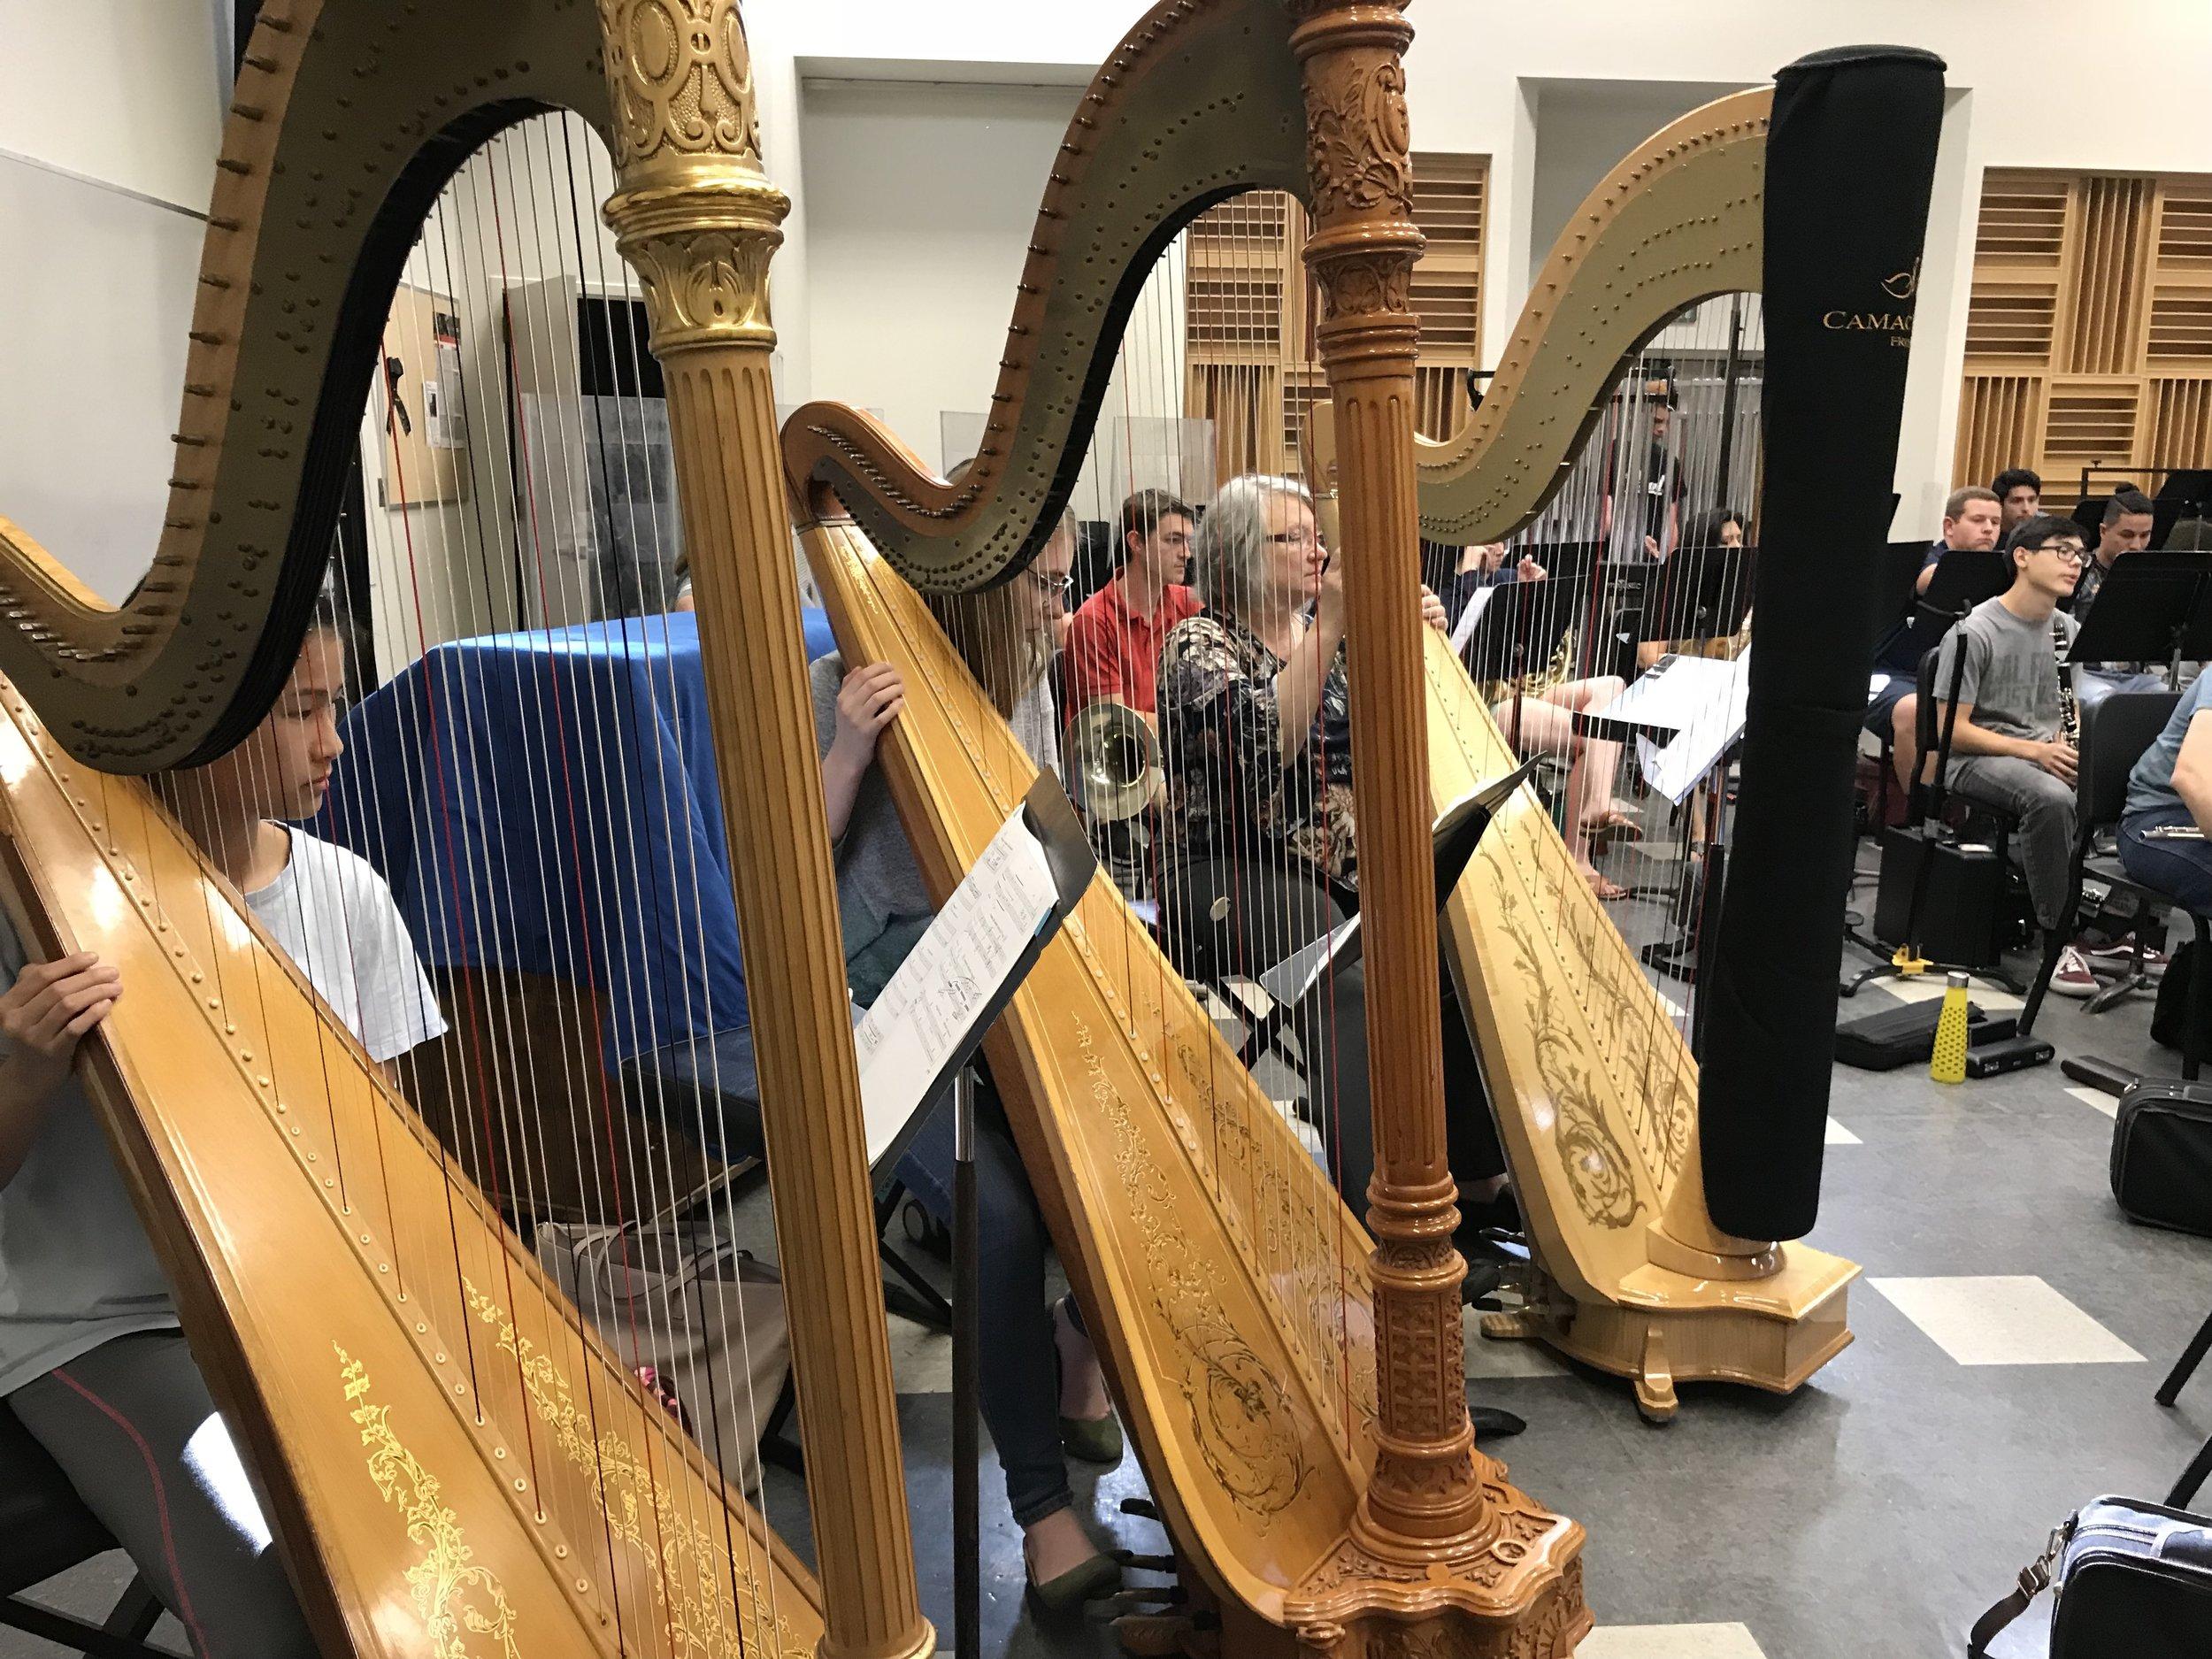 FOOSA harps in rehearsal